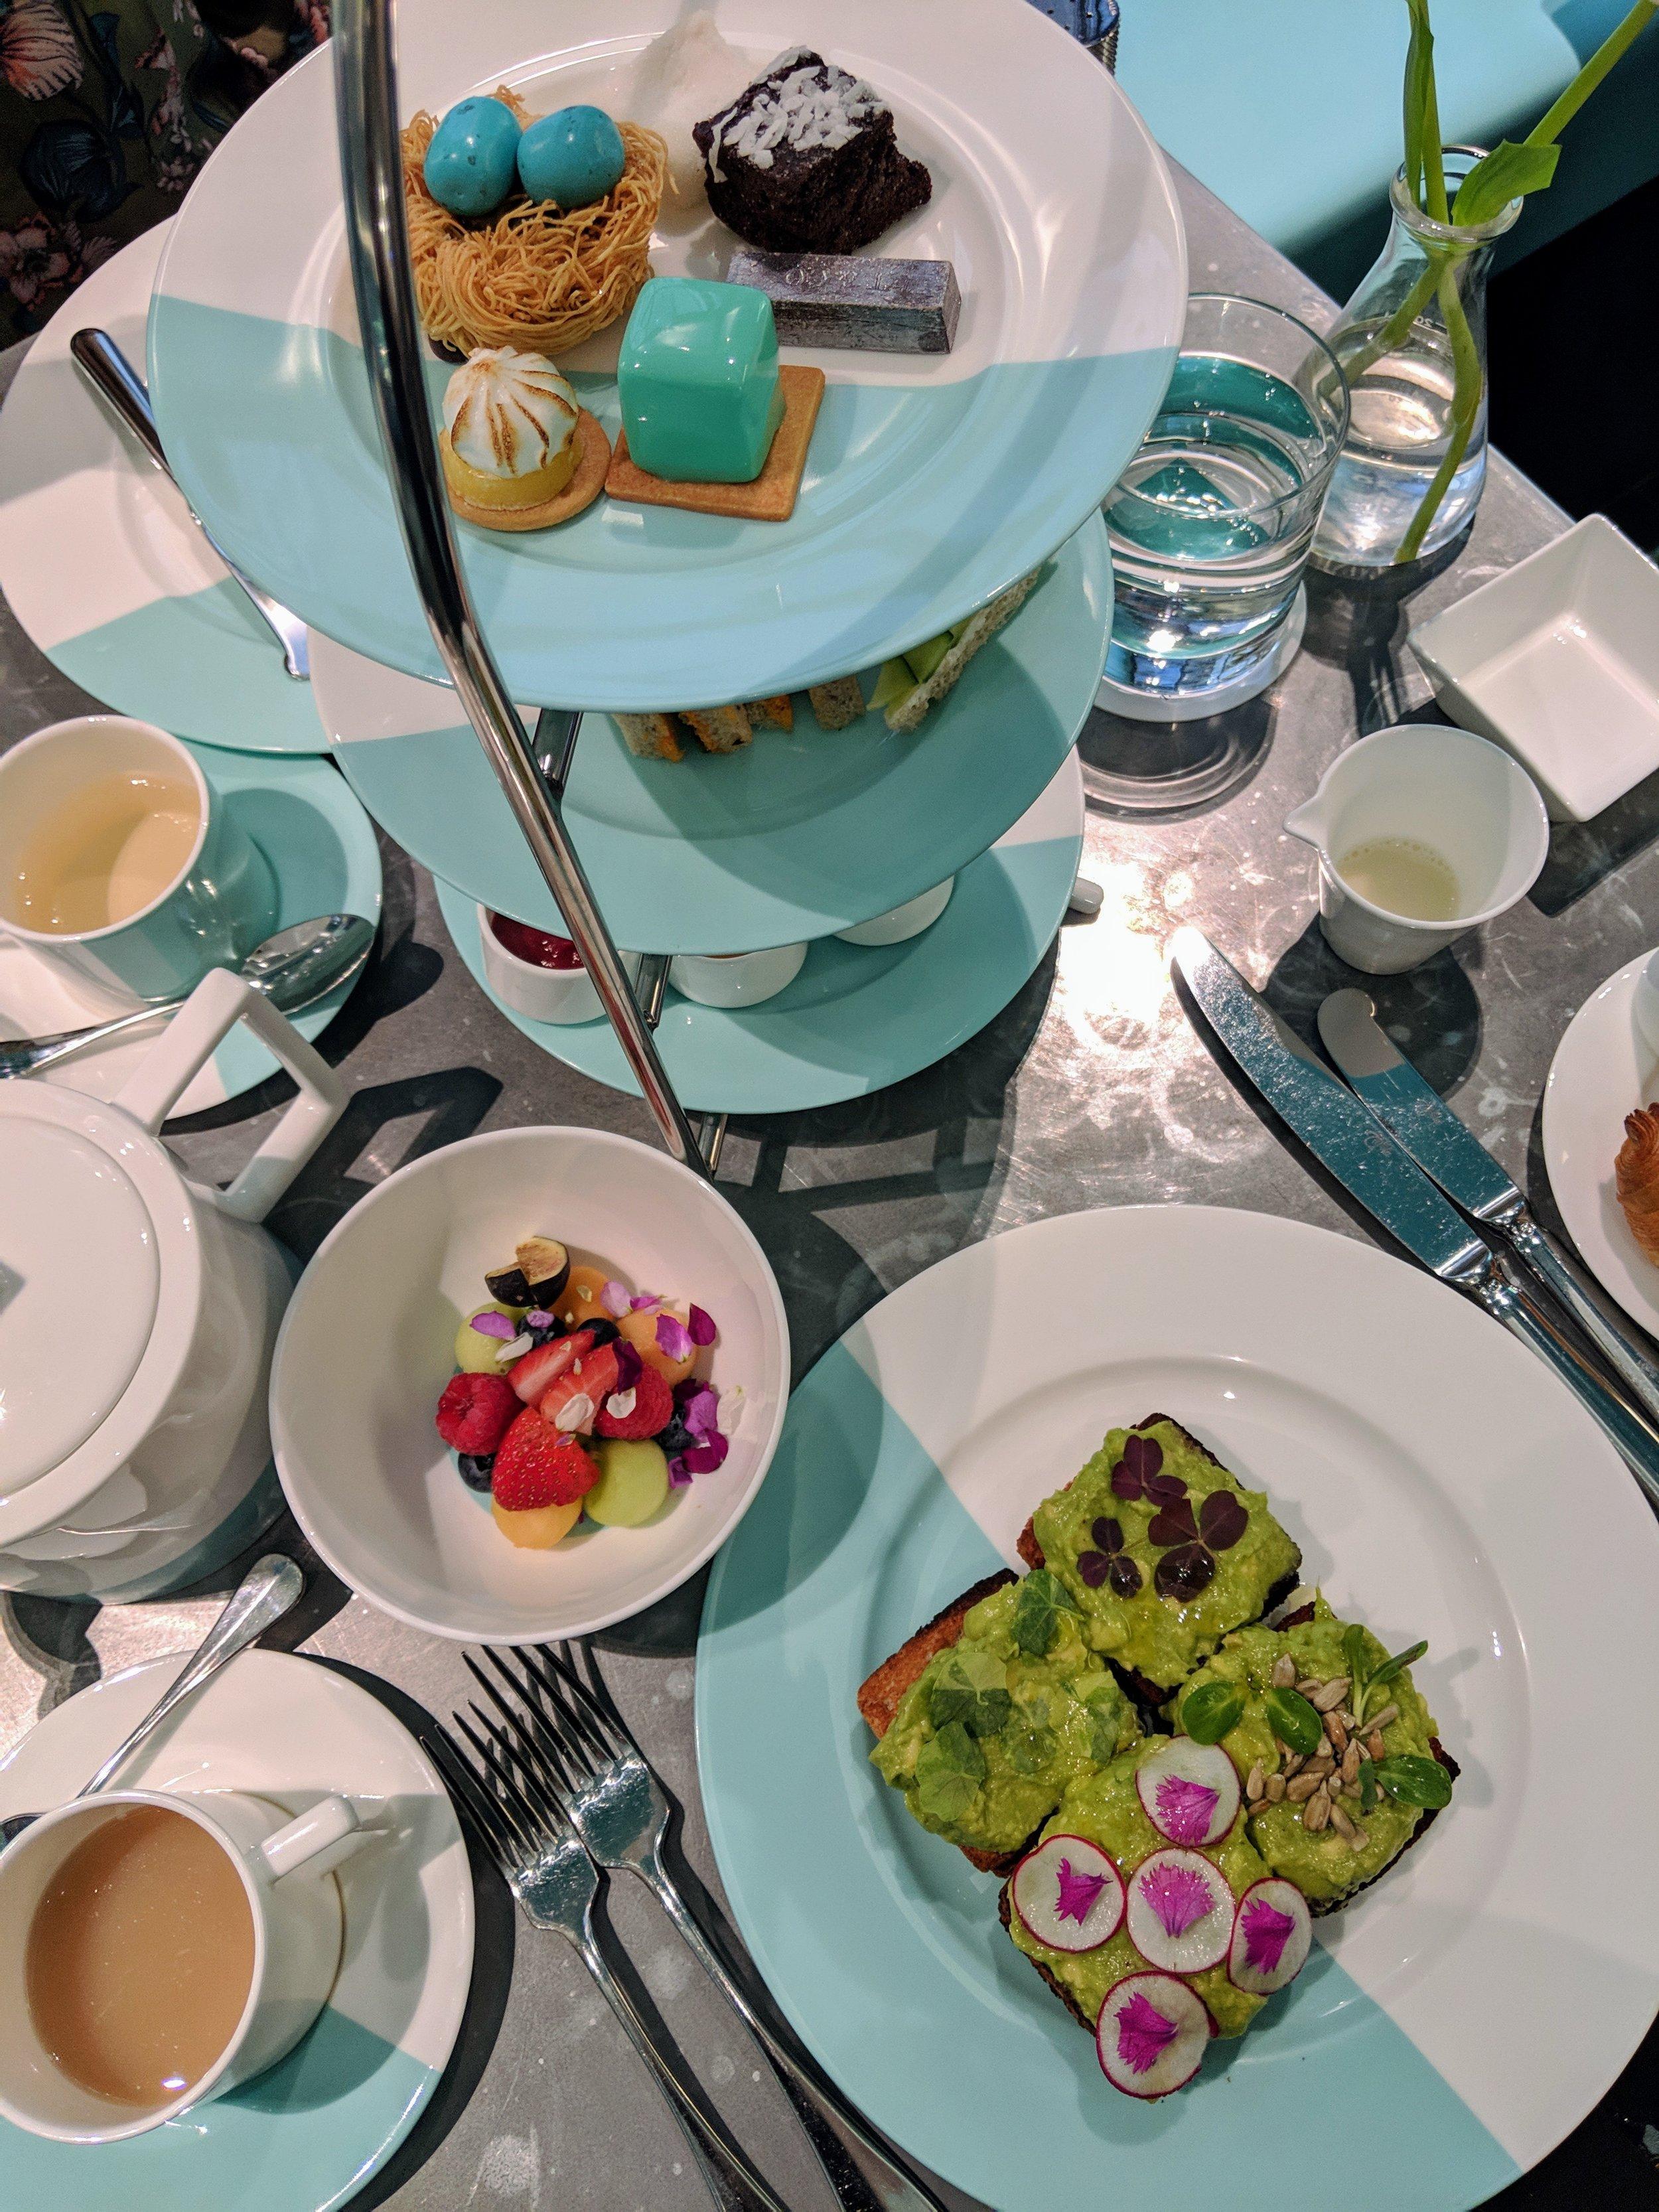 TIFFANY TEA  Tiffany's Bird's Nest, Blue Box Petit Four, Coconut Brownie, Key Lime Tart, Lemon Jelly Square, Chocolate Ingot